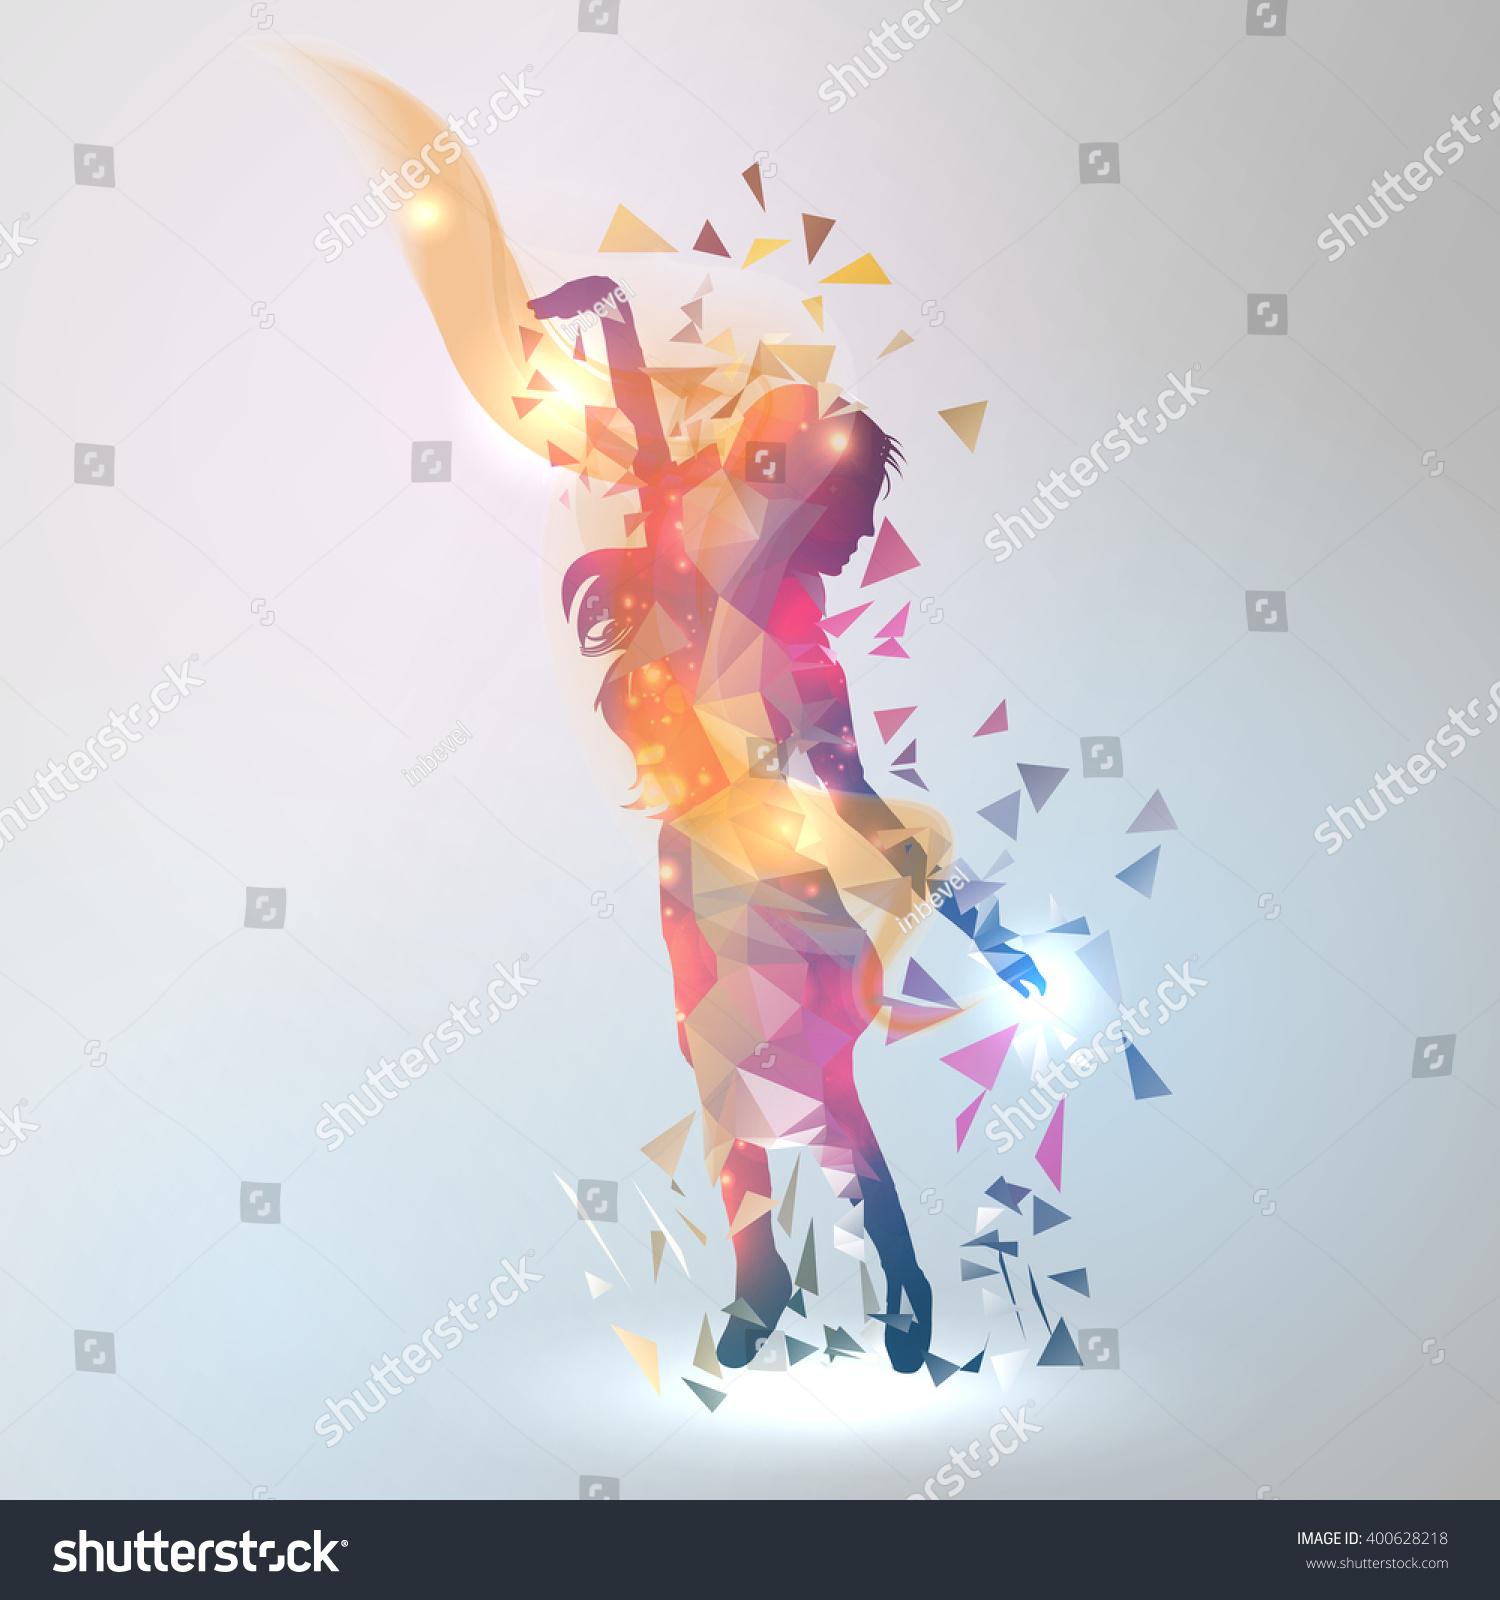 07b289771 Abstract Geometric Dancing Girl Vector Illustration Stock Vector ...